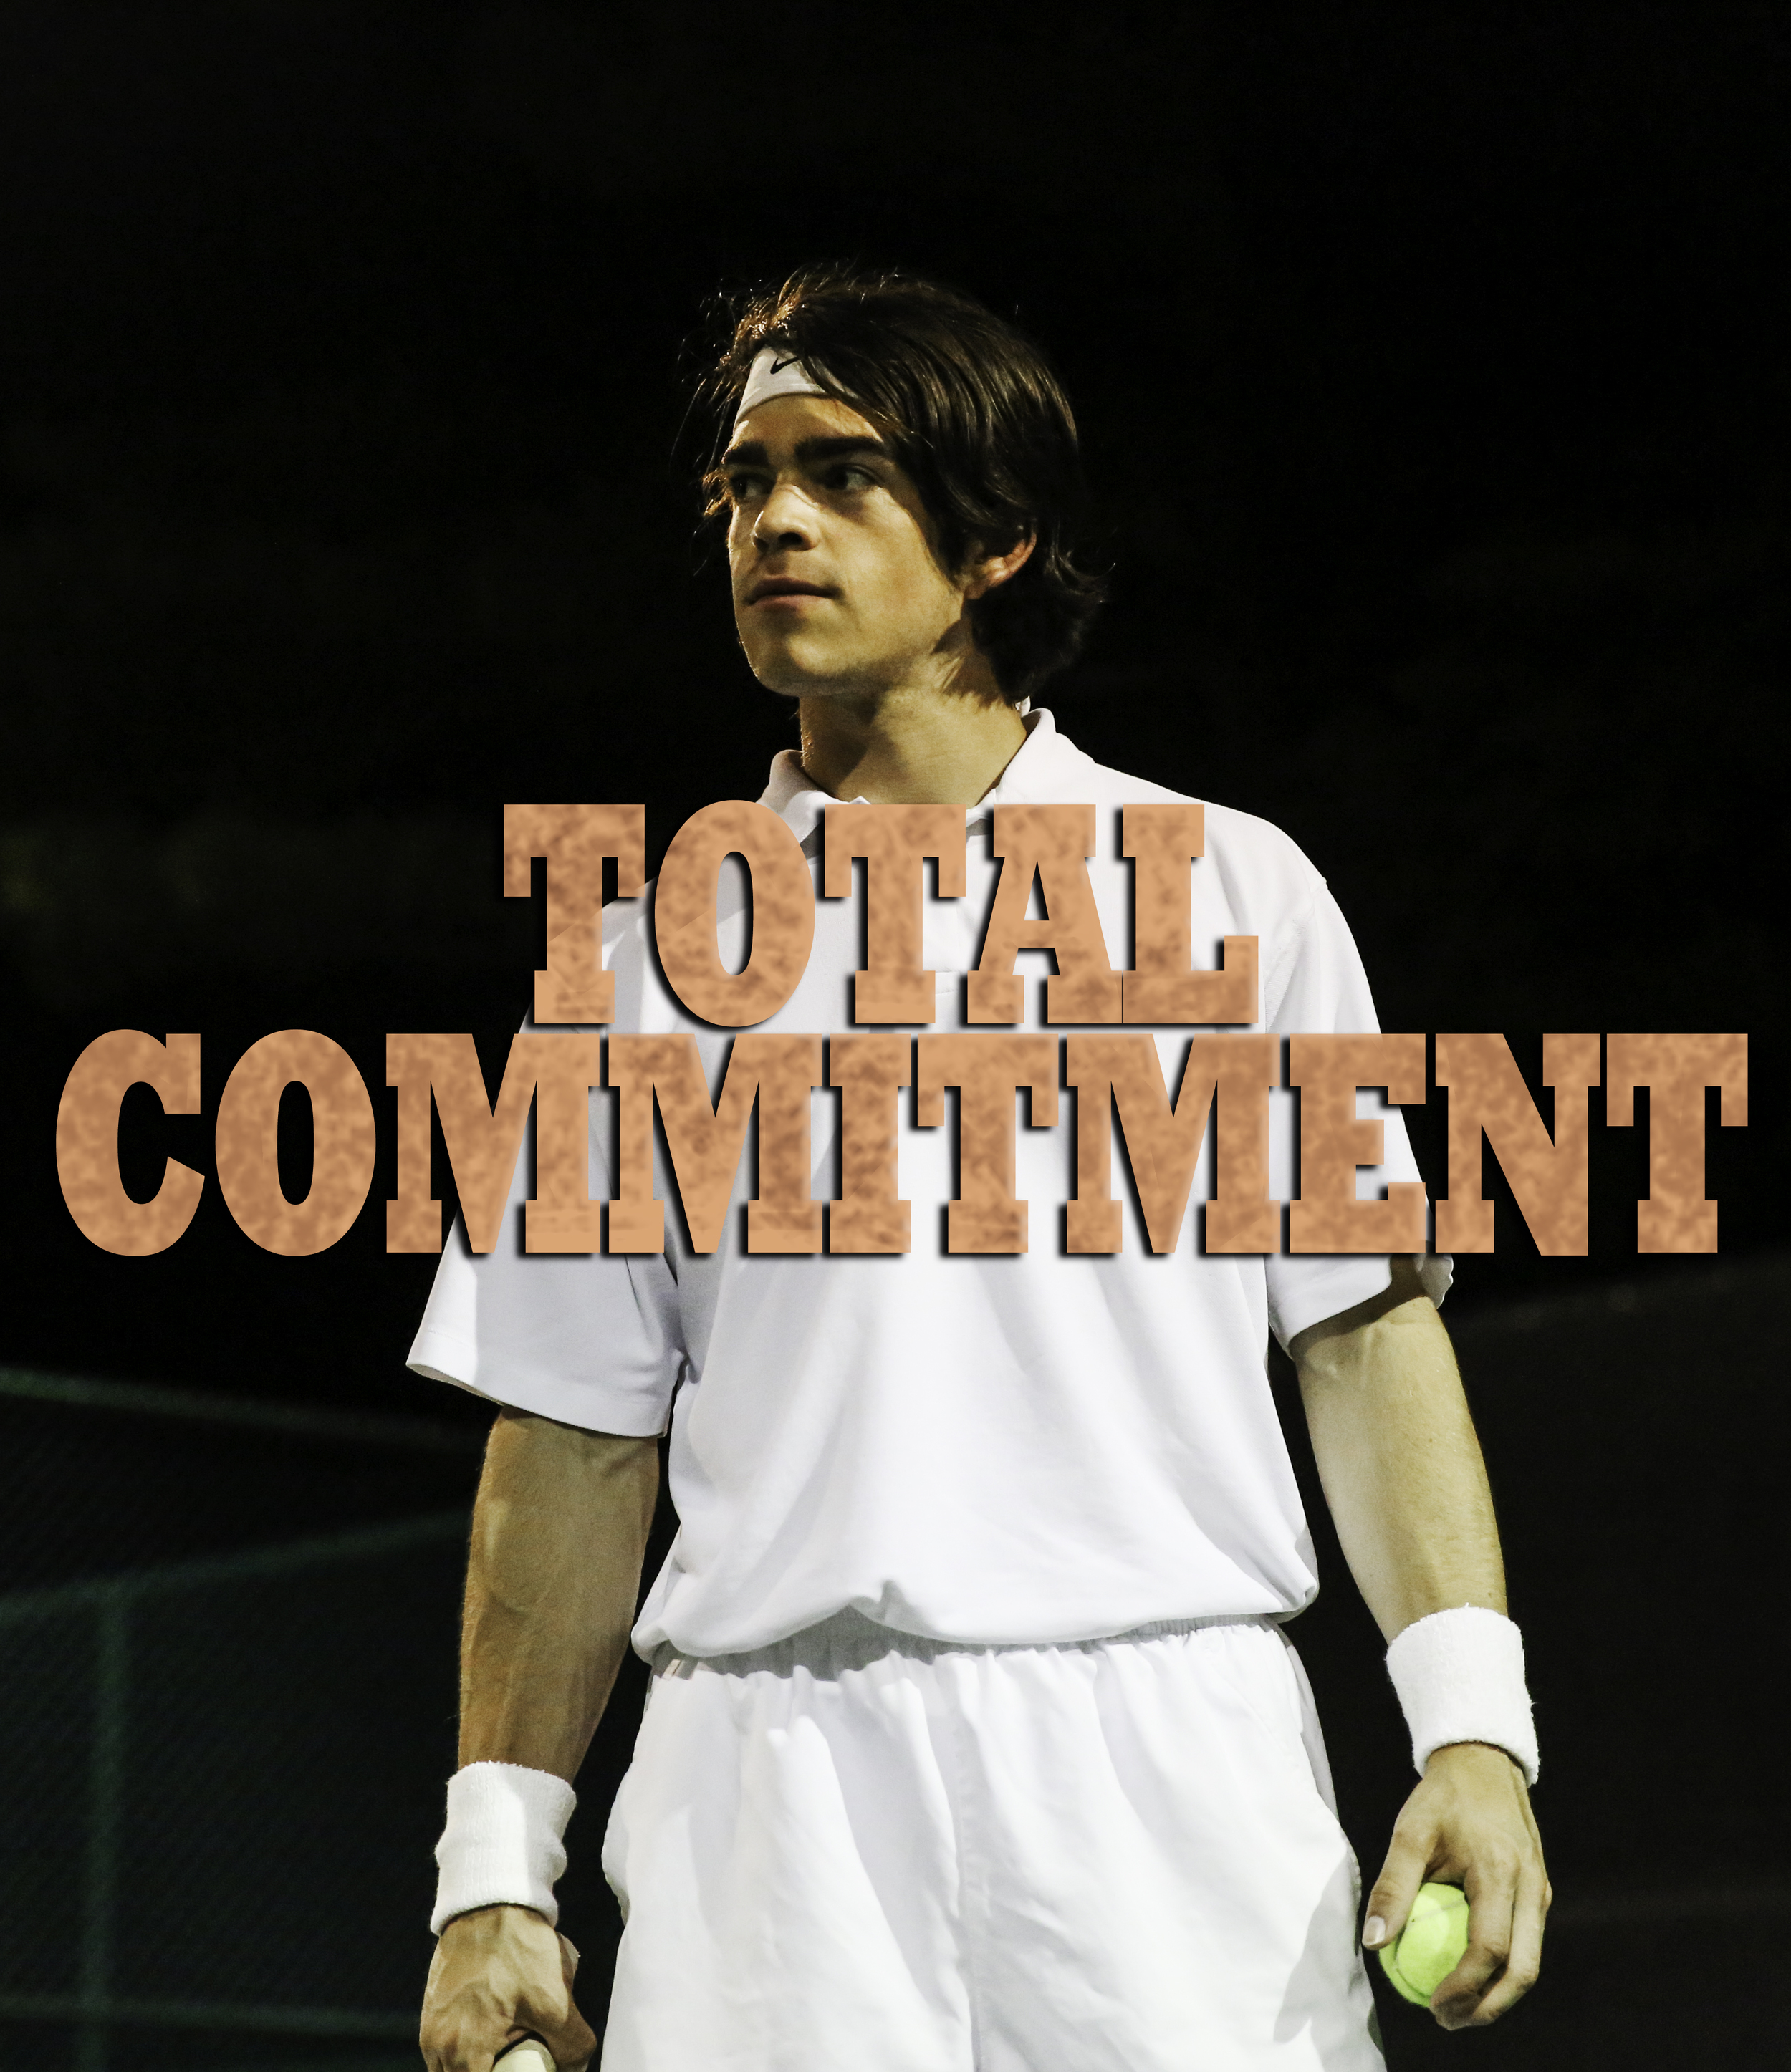 TOTAL COMMITMENT.jpg